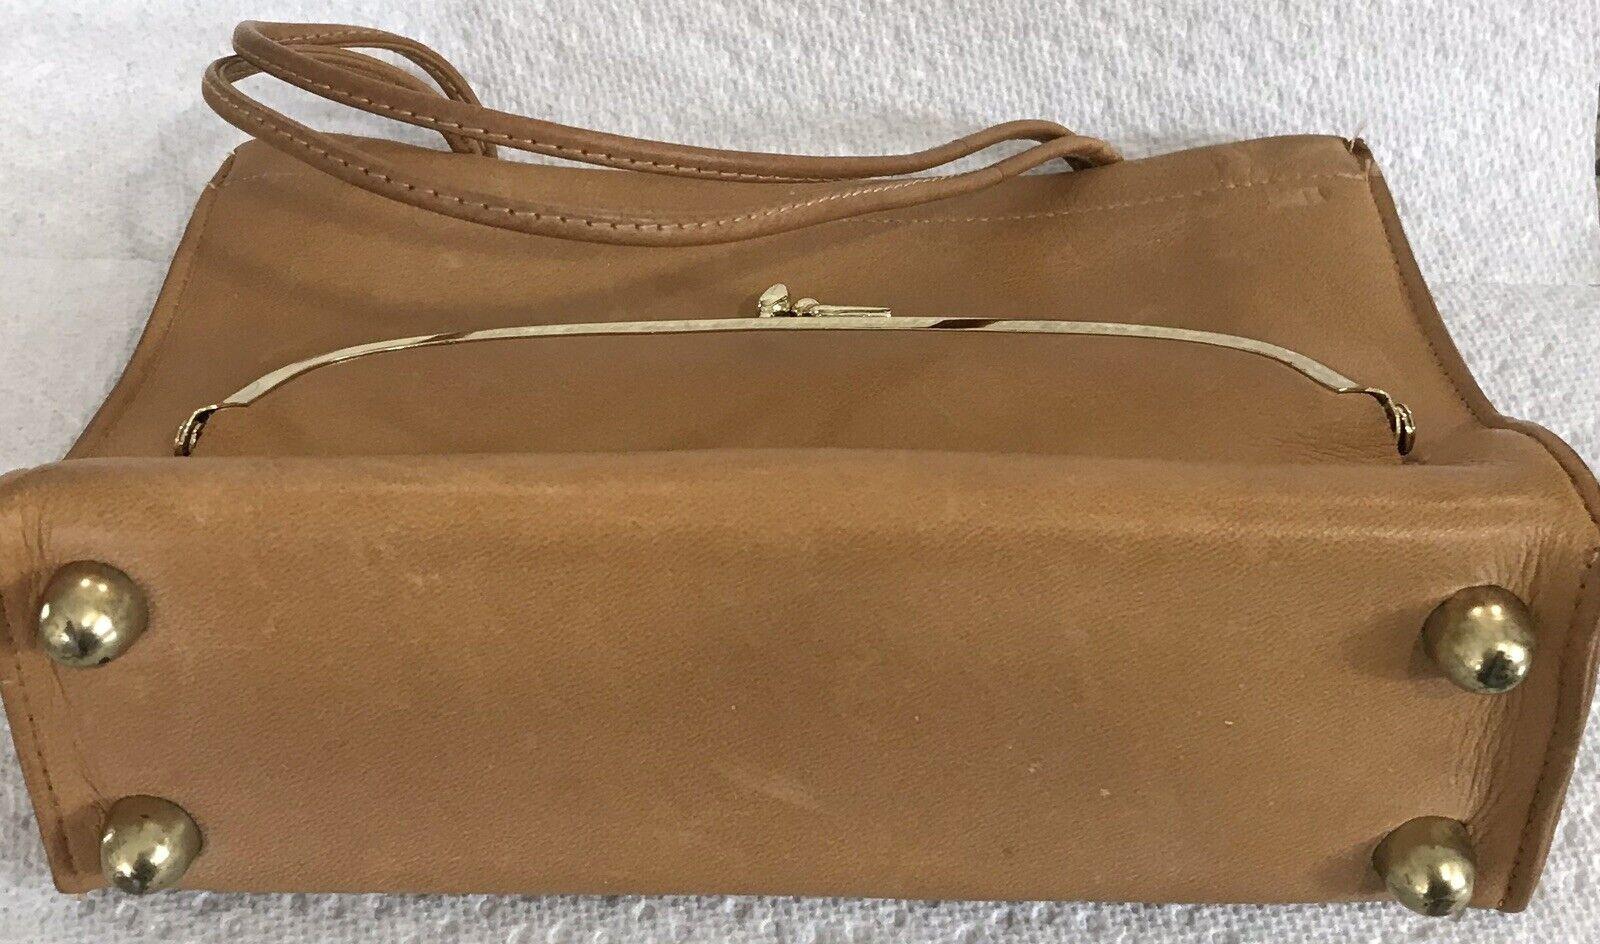 Vintage Coach Rare Leather Bonnie Cashin Stripe I… - image 5